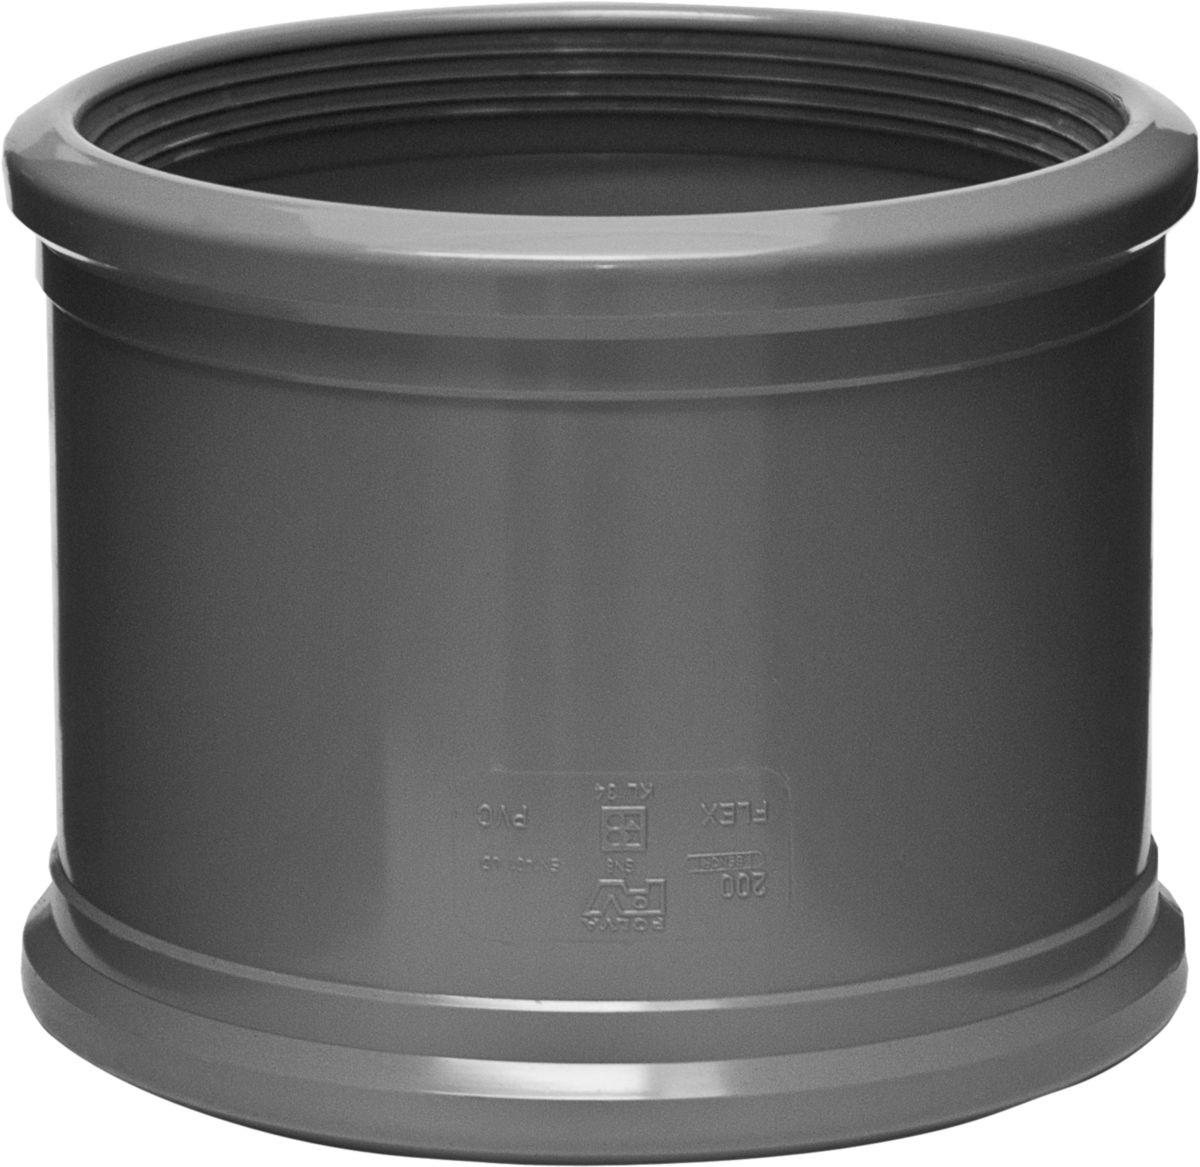 Manchon Pvc Coulissant Sdr41cr4 Diamètre 110mm Pipelife 1196900809